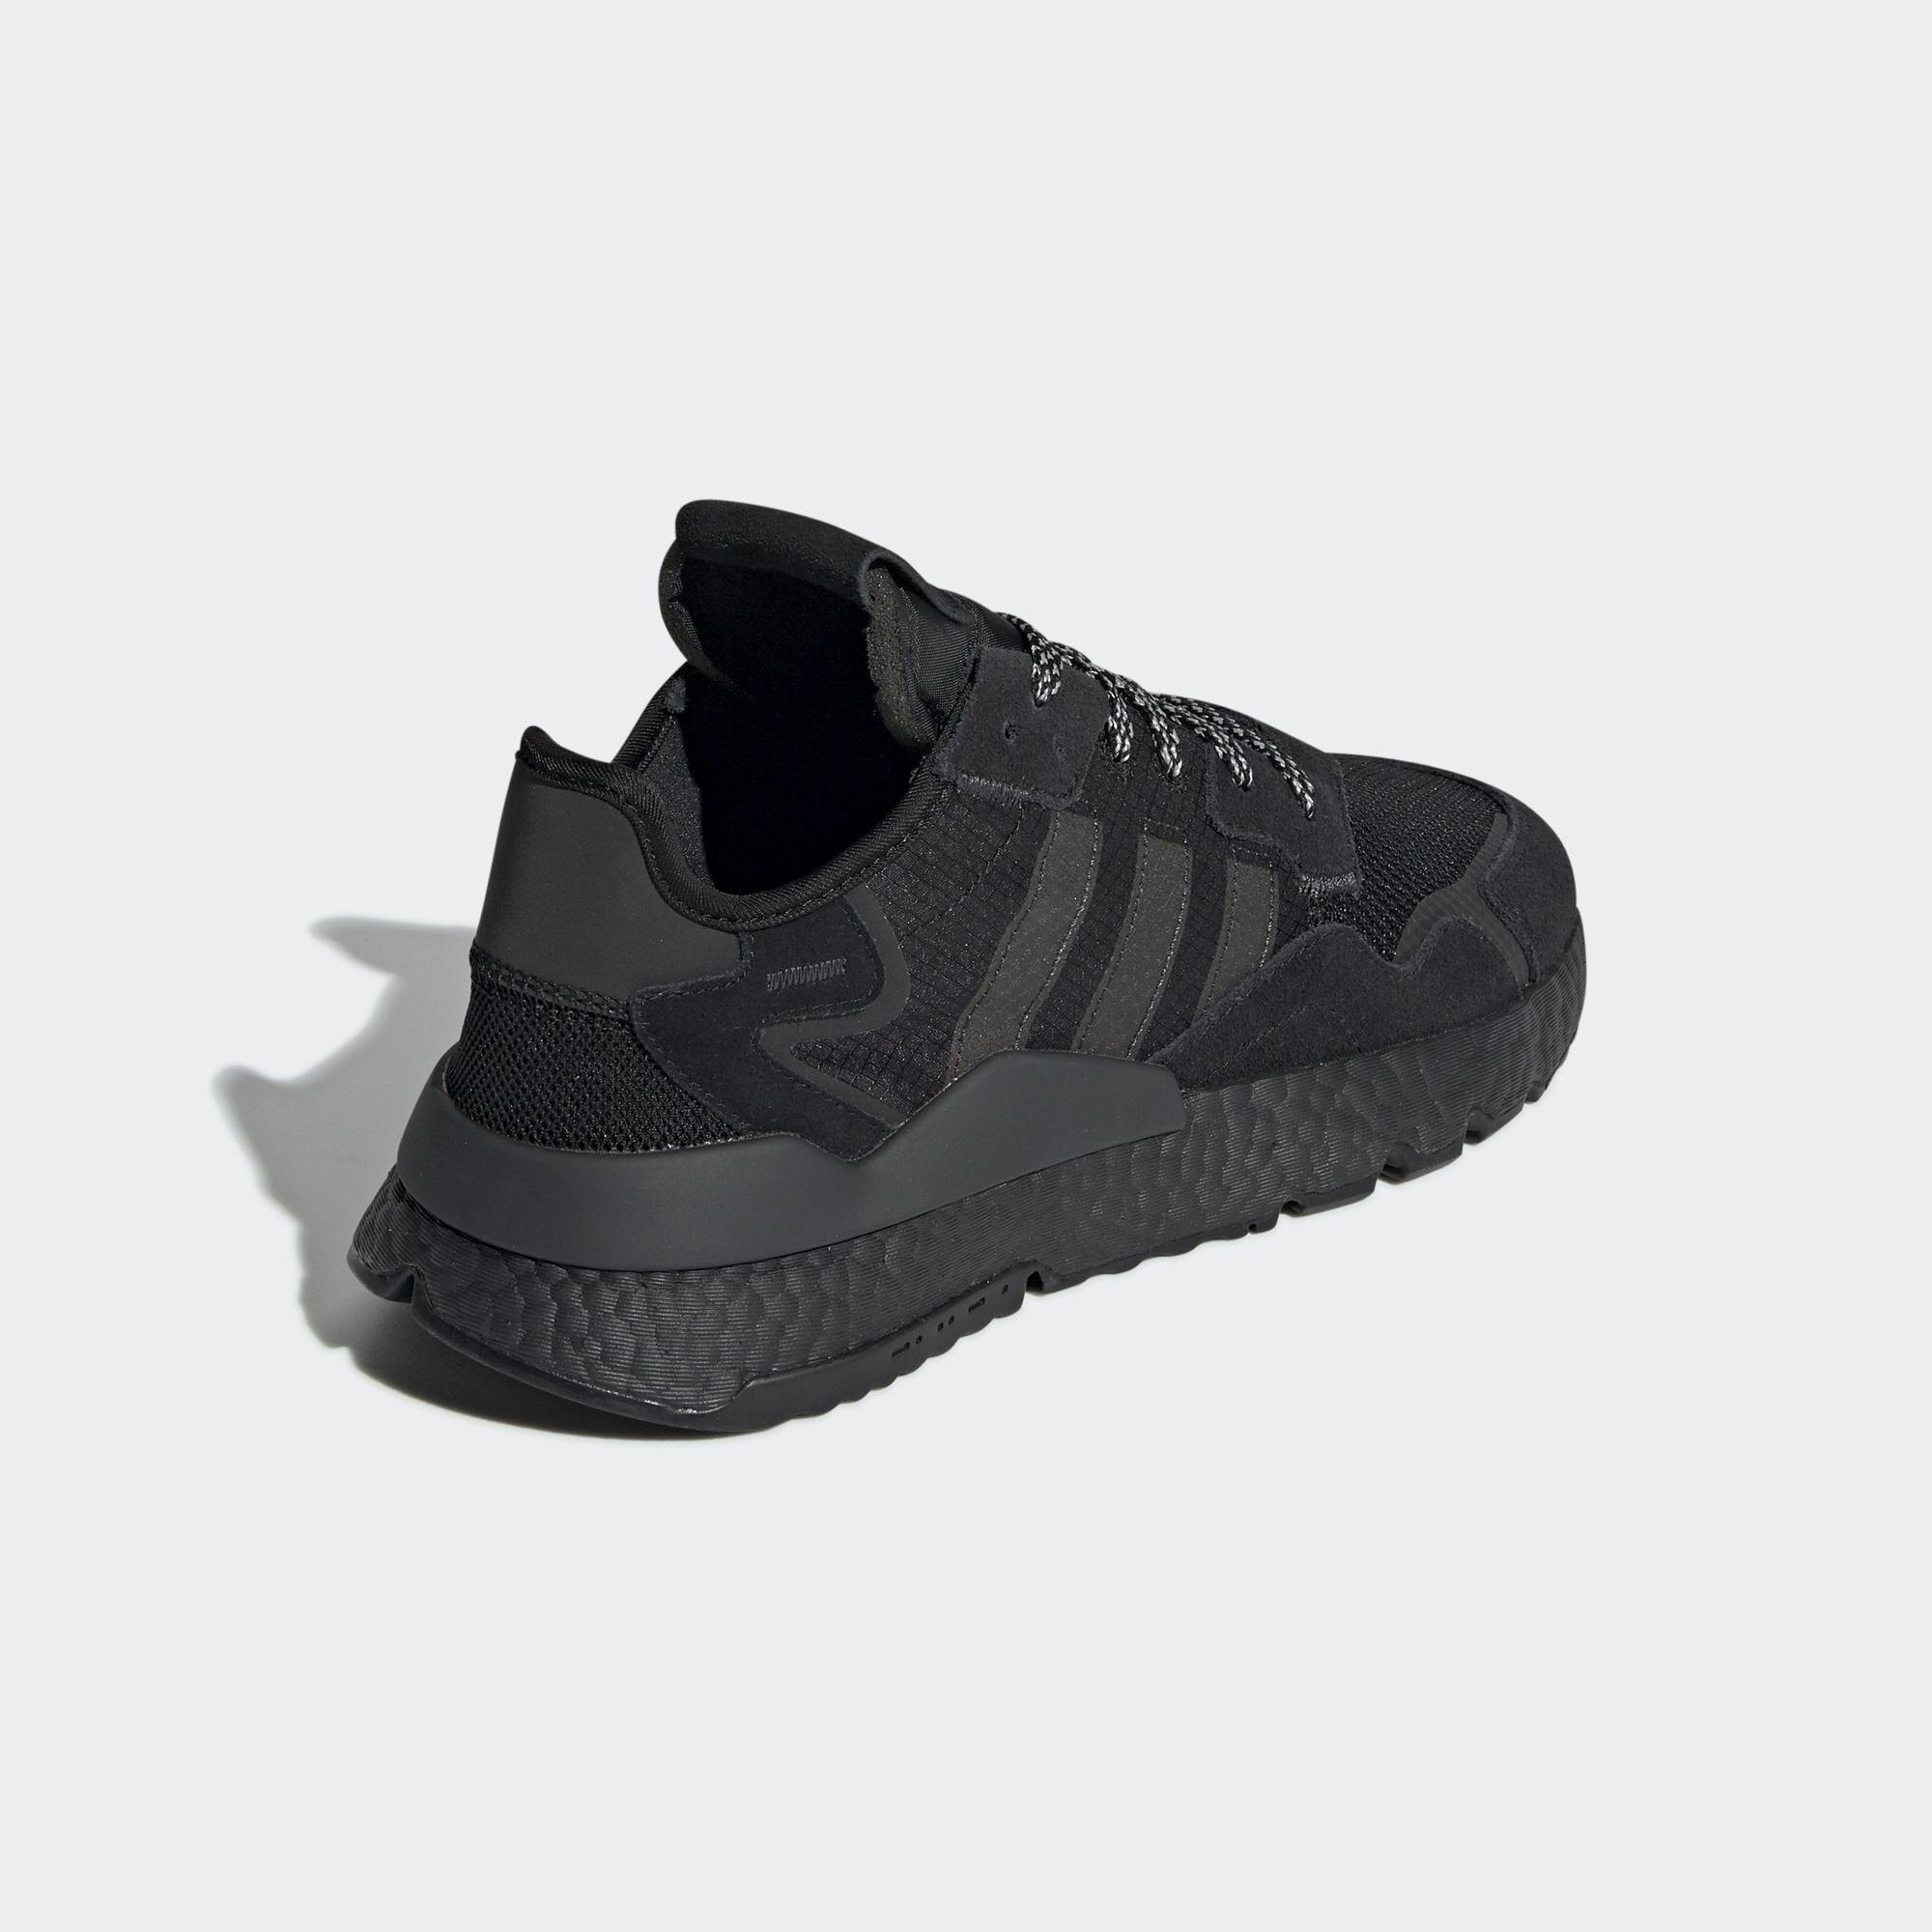 【ADIDAS】 NITE JOGGER 休閒鞋 慢跑鞋 男 訂價5290 BD7954 (Palace store) 3